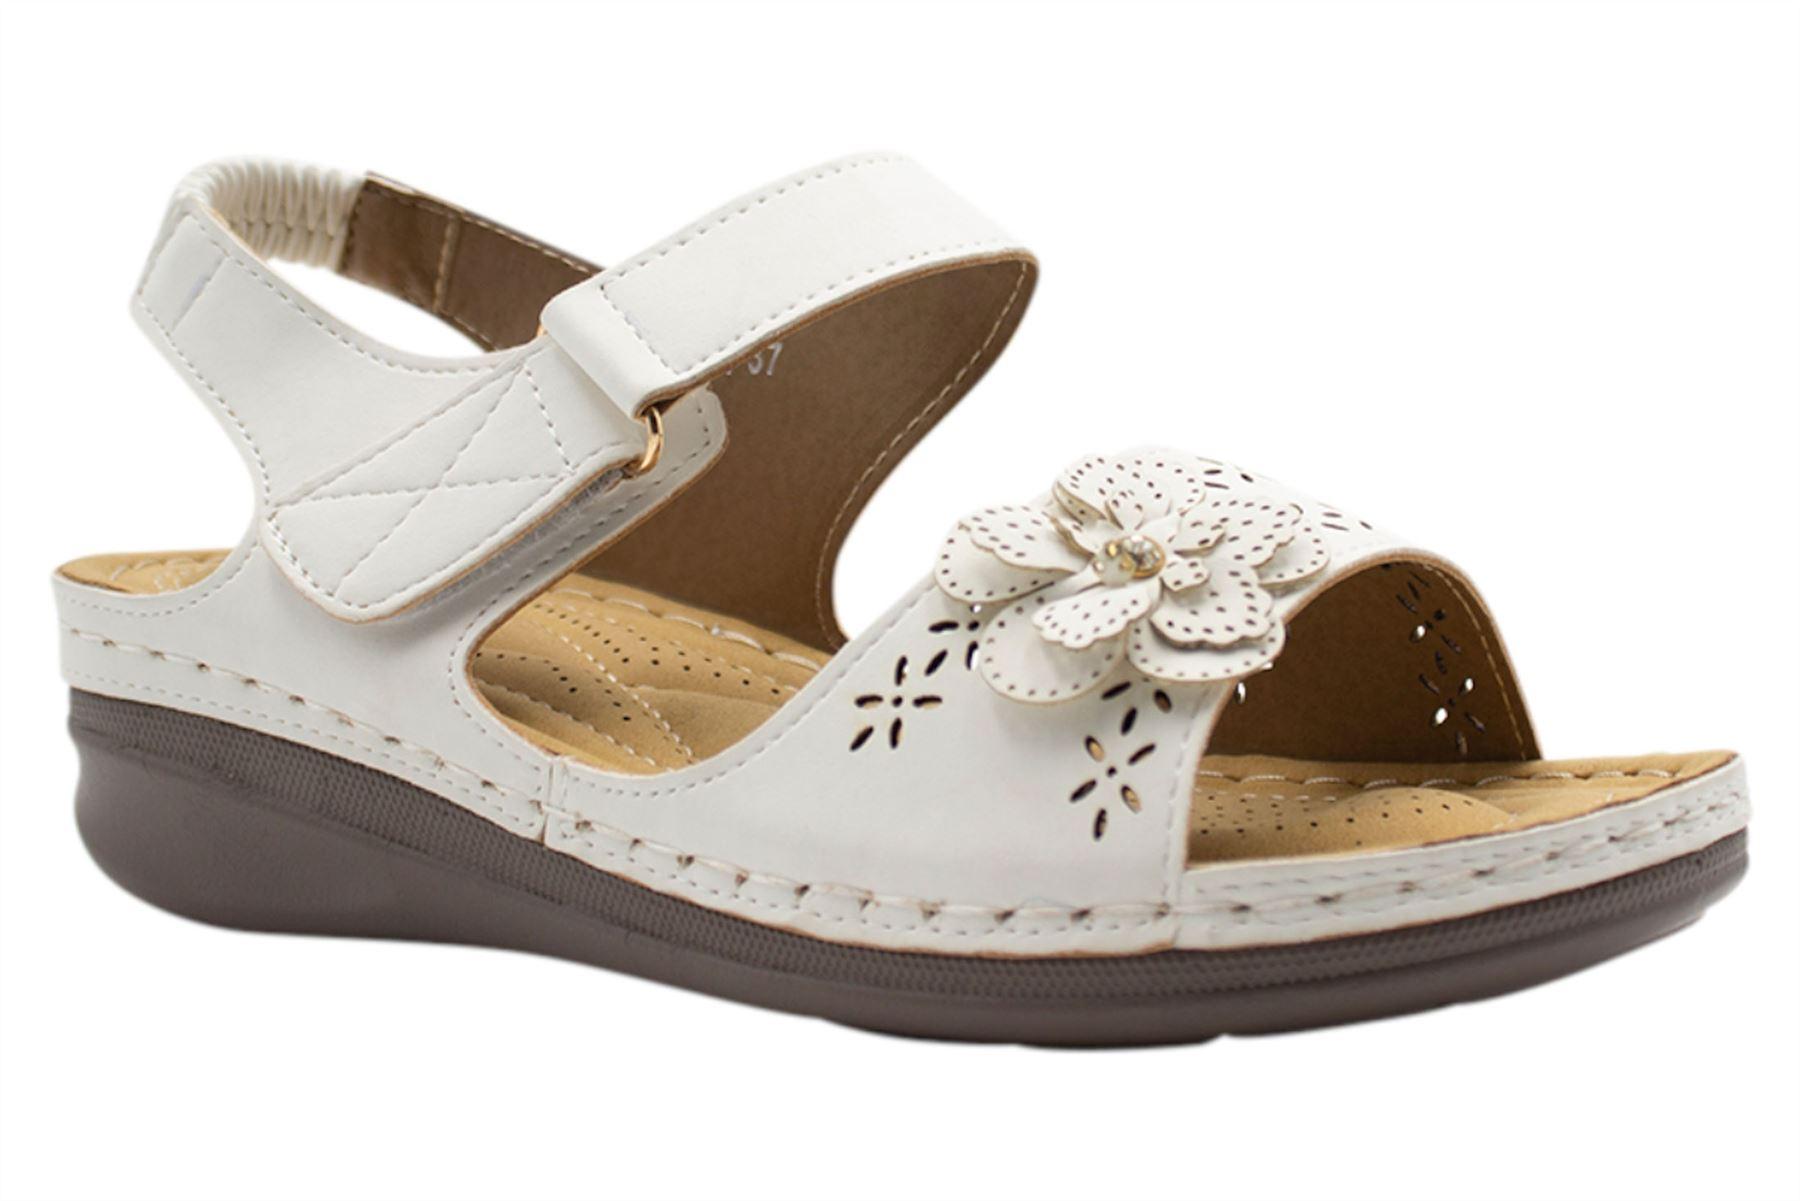 Ladies-Sandals-Womens-Mid-Heel-Comfort-Summer-Beach-Casual-Wear miniatura 45